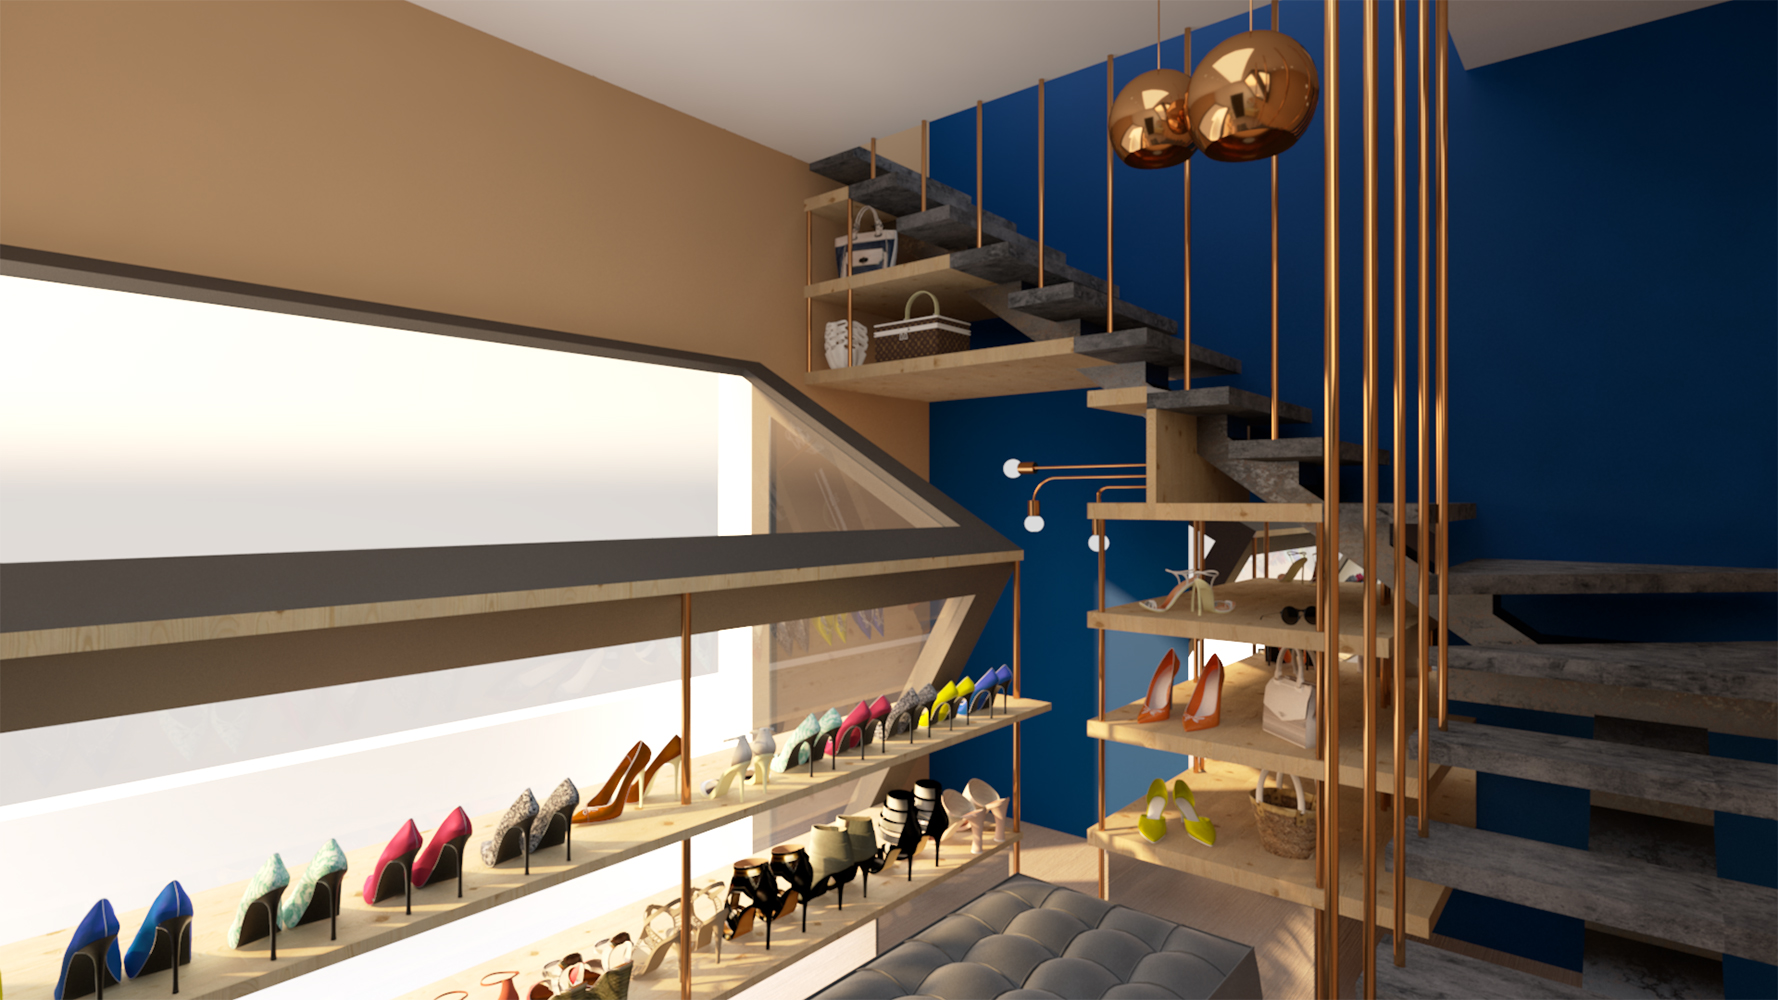 midrie-arquitetura-shoes-shop-02.jpg